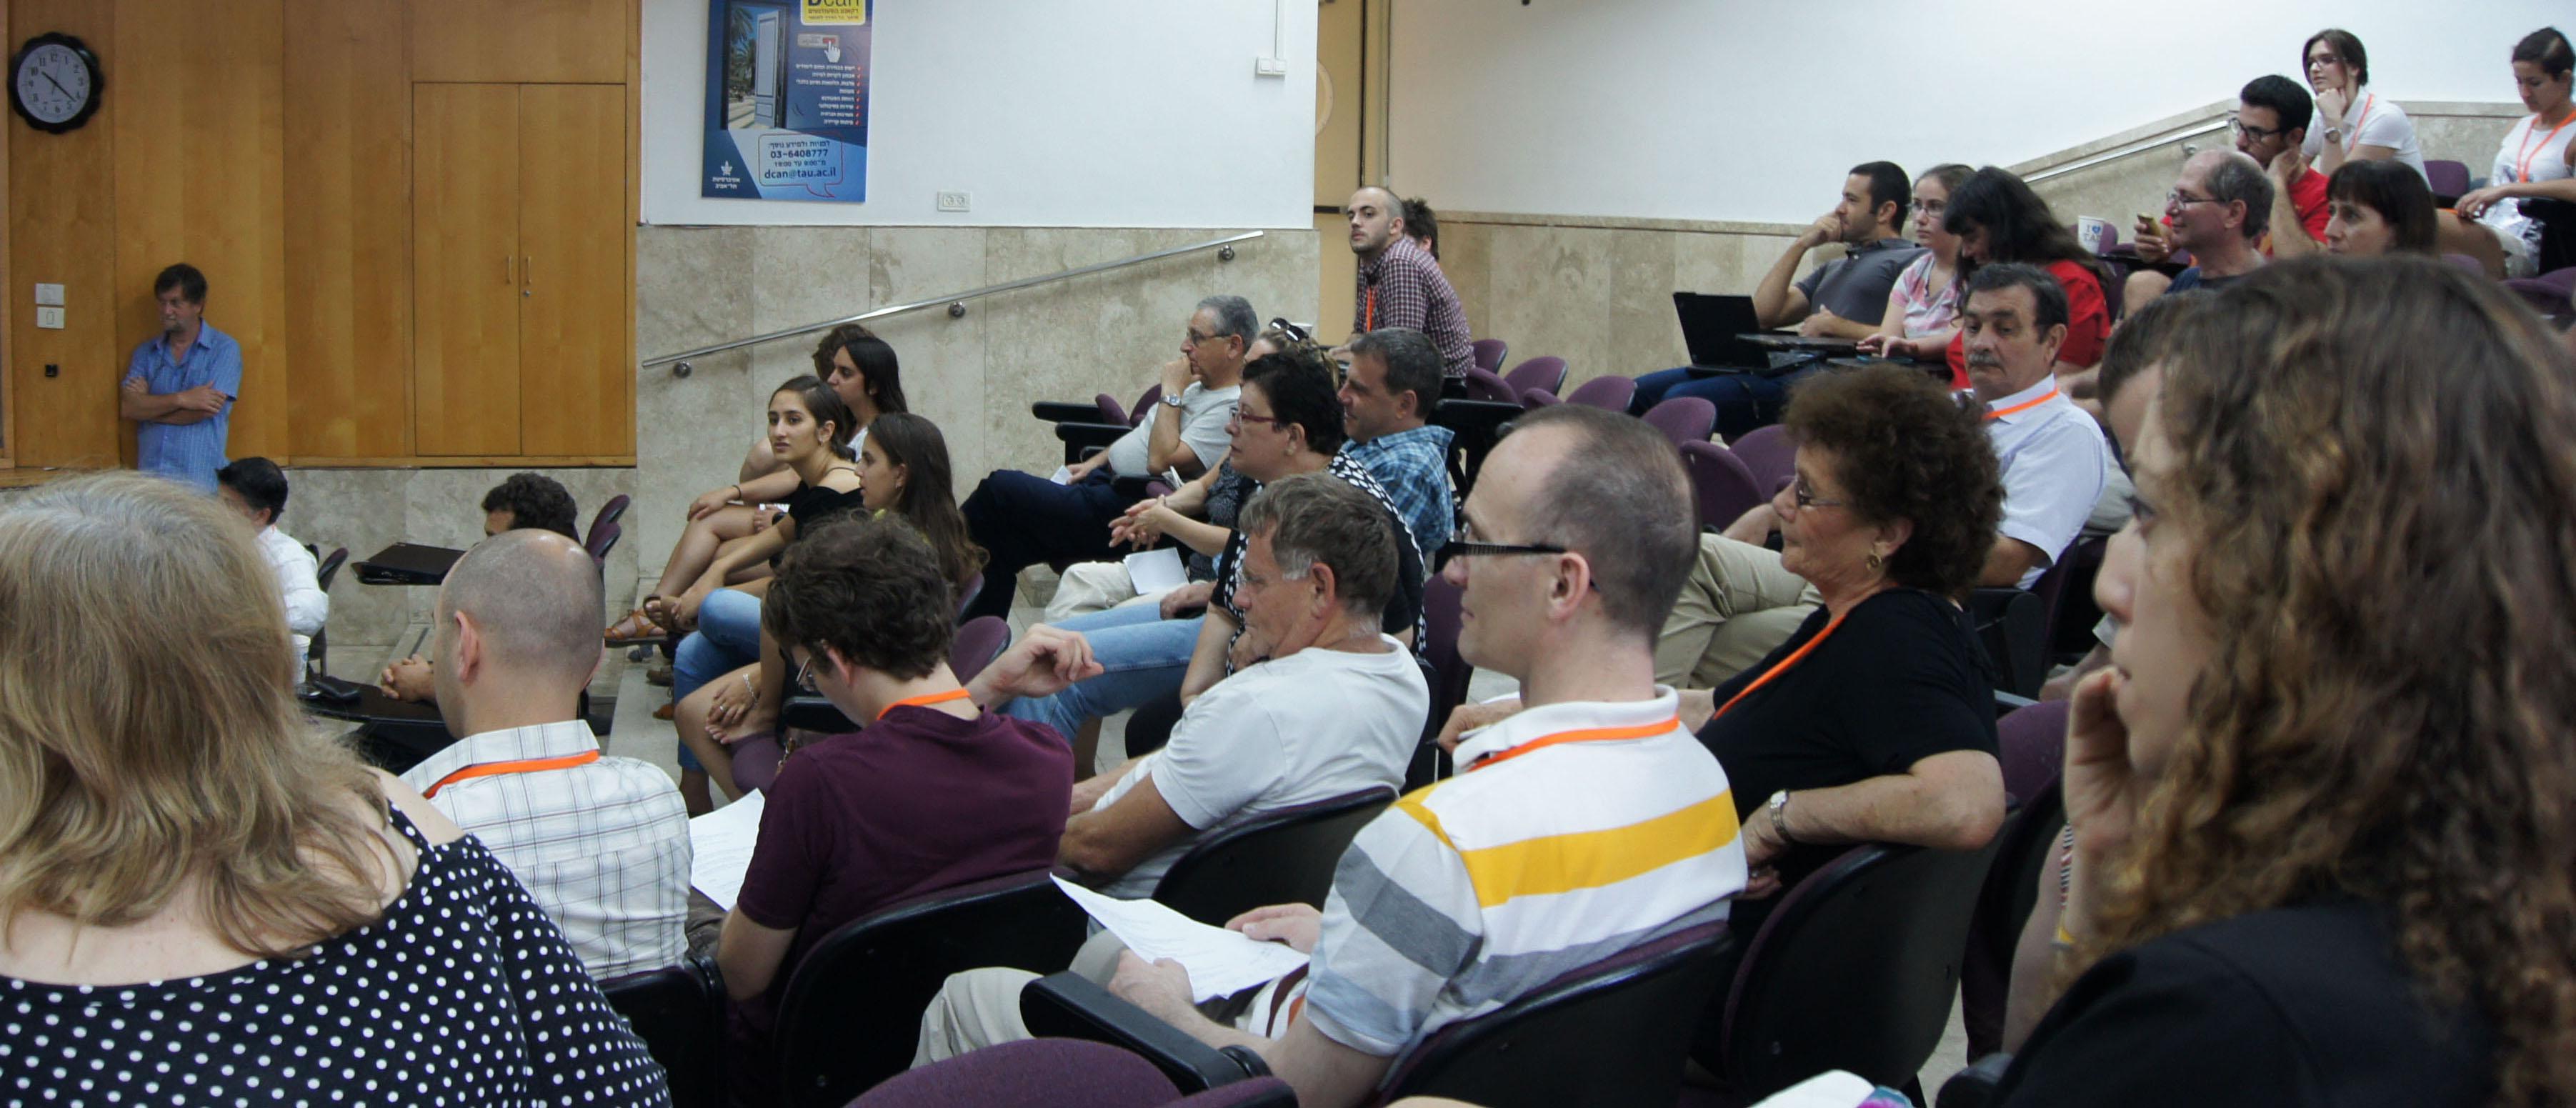 Audience -